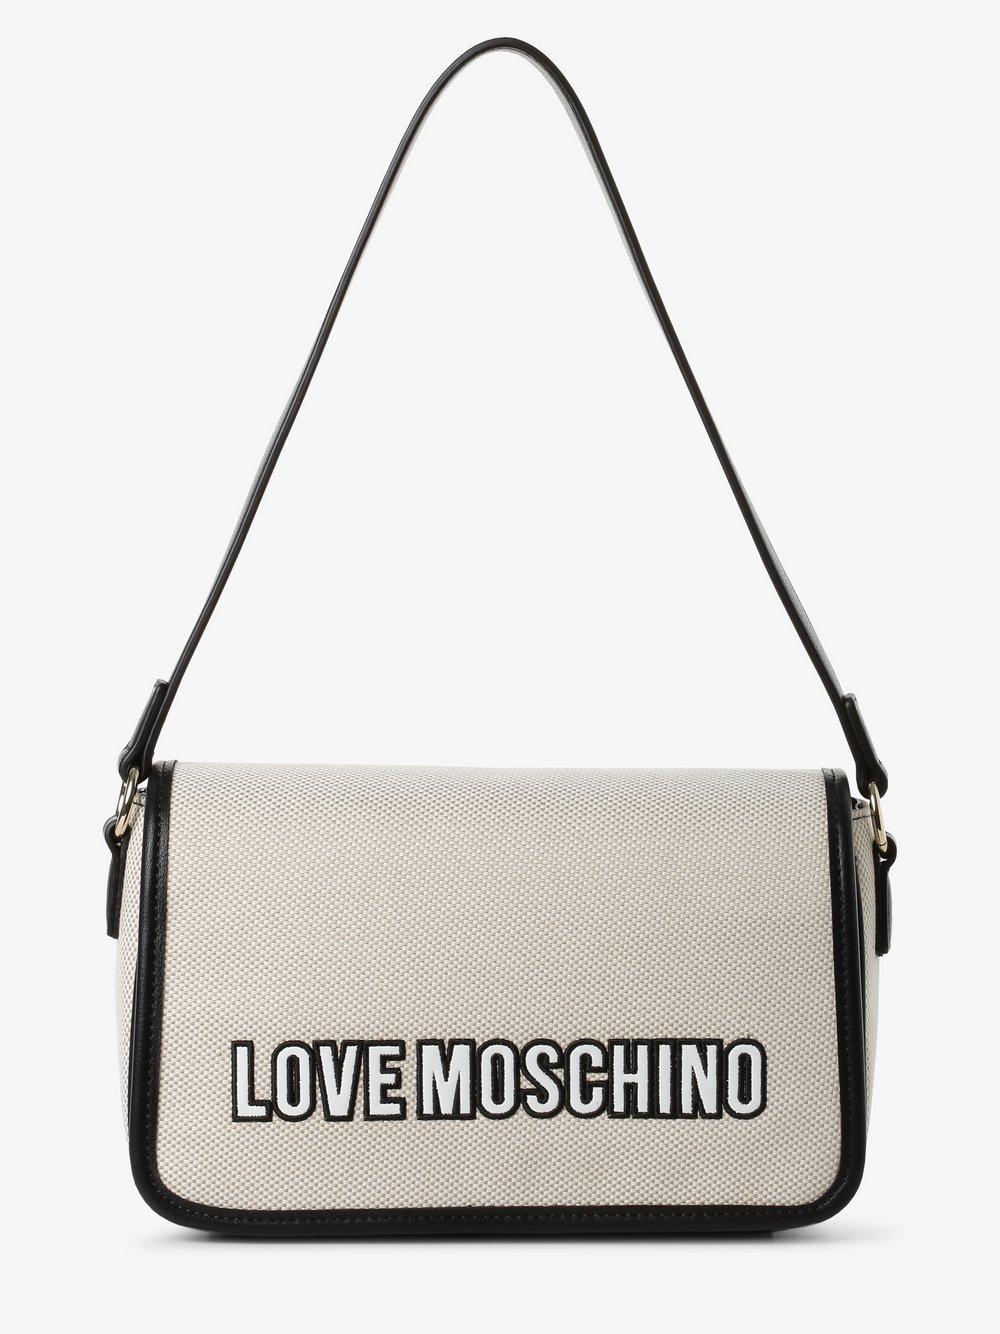 Love Moschino - Torebka damska, beżowy